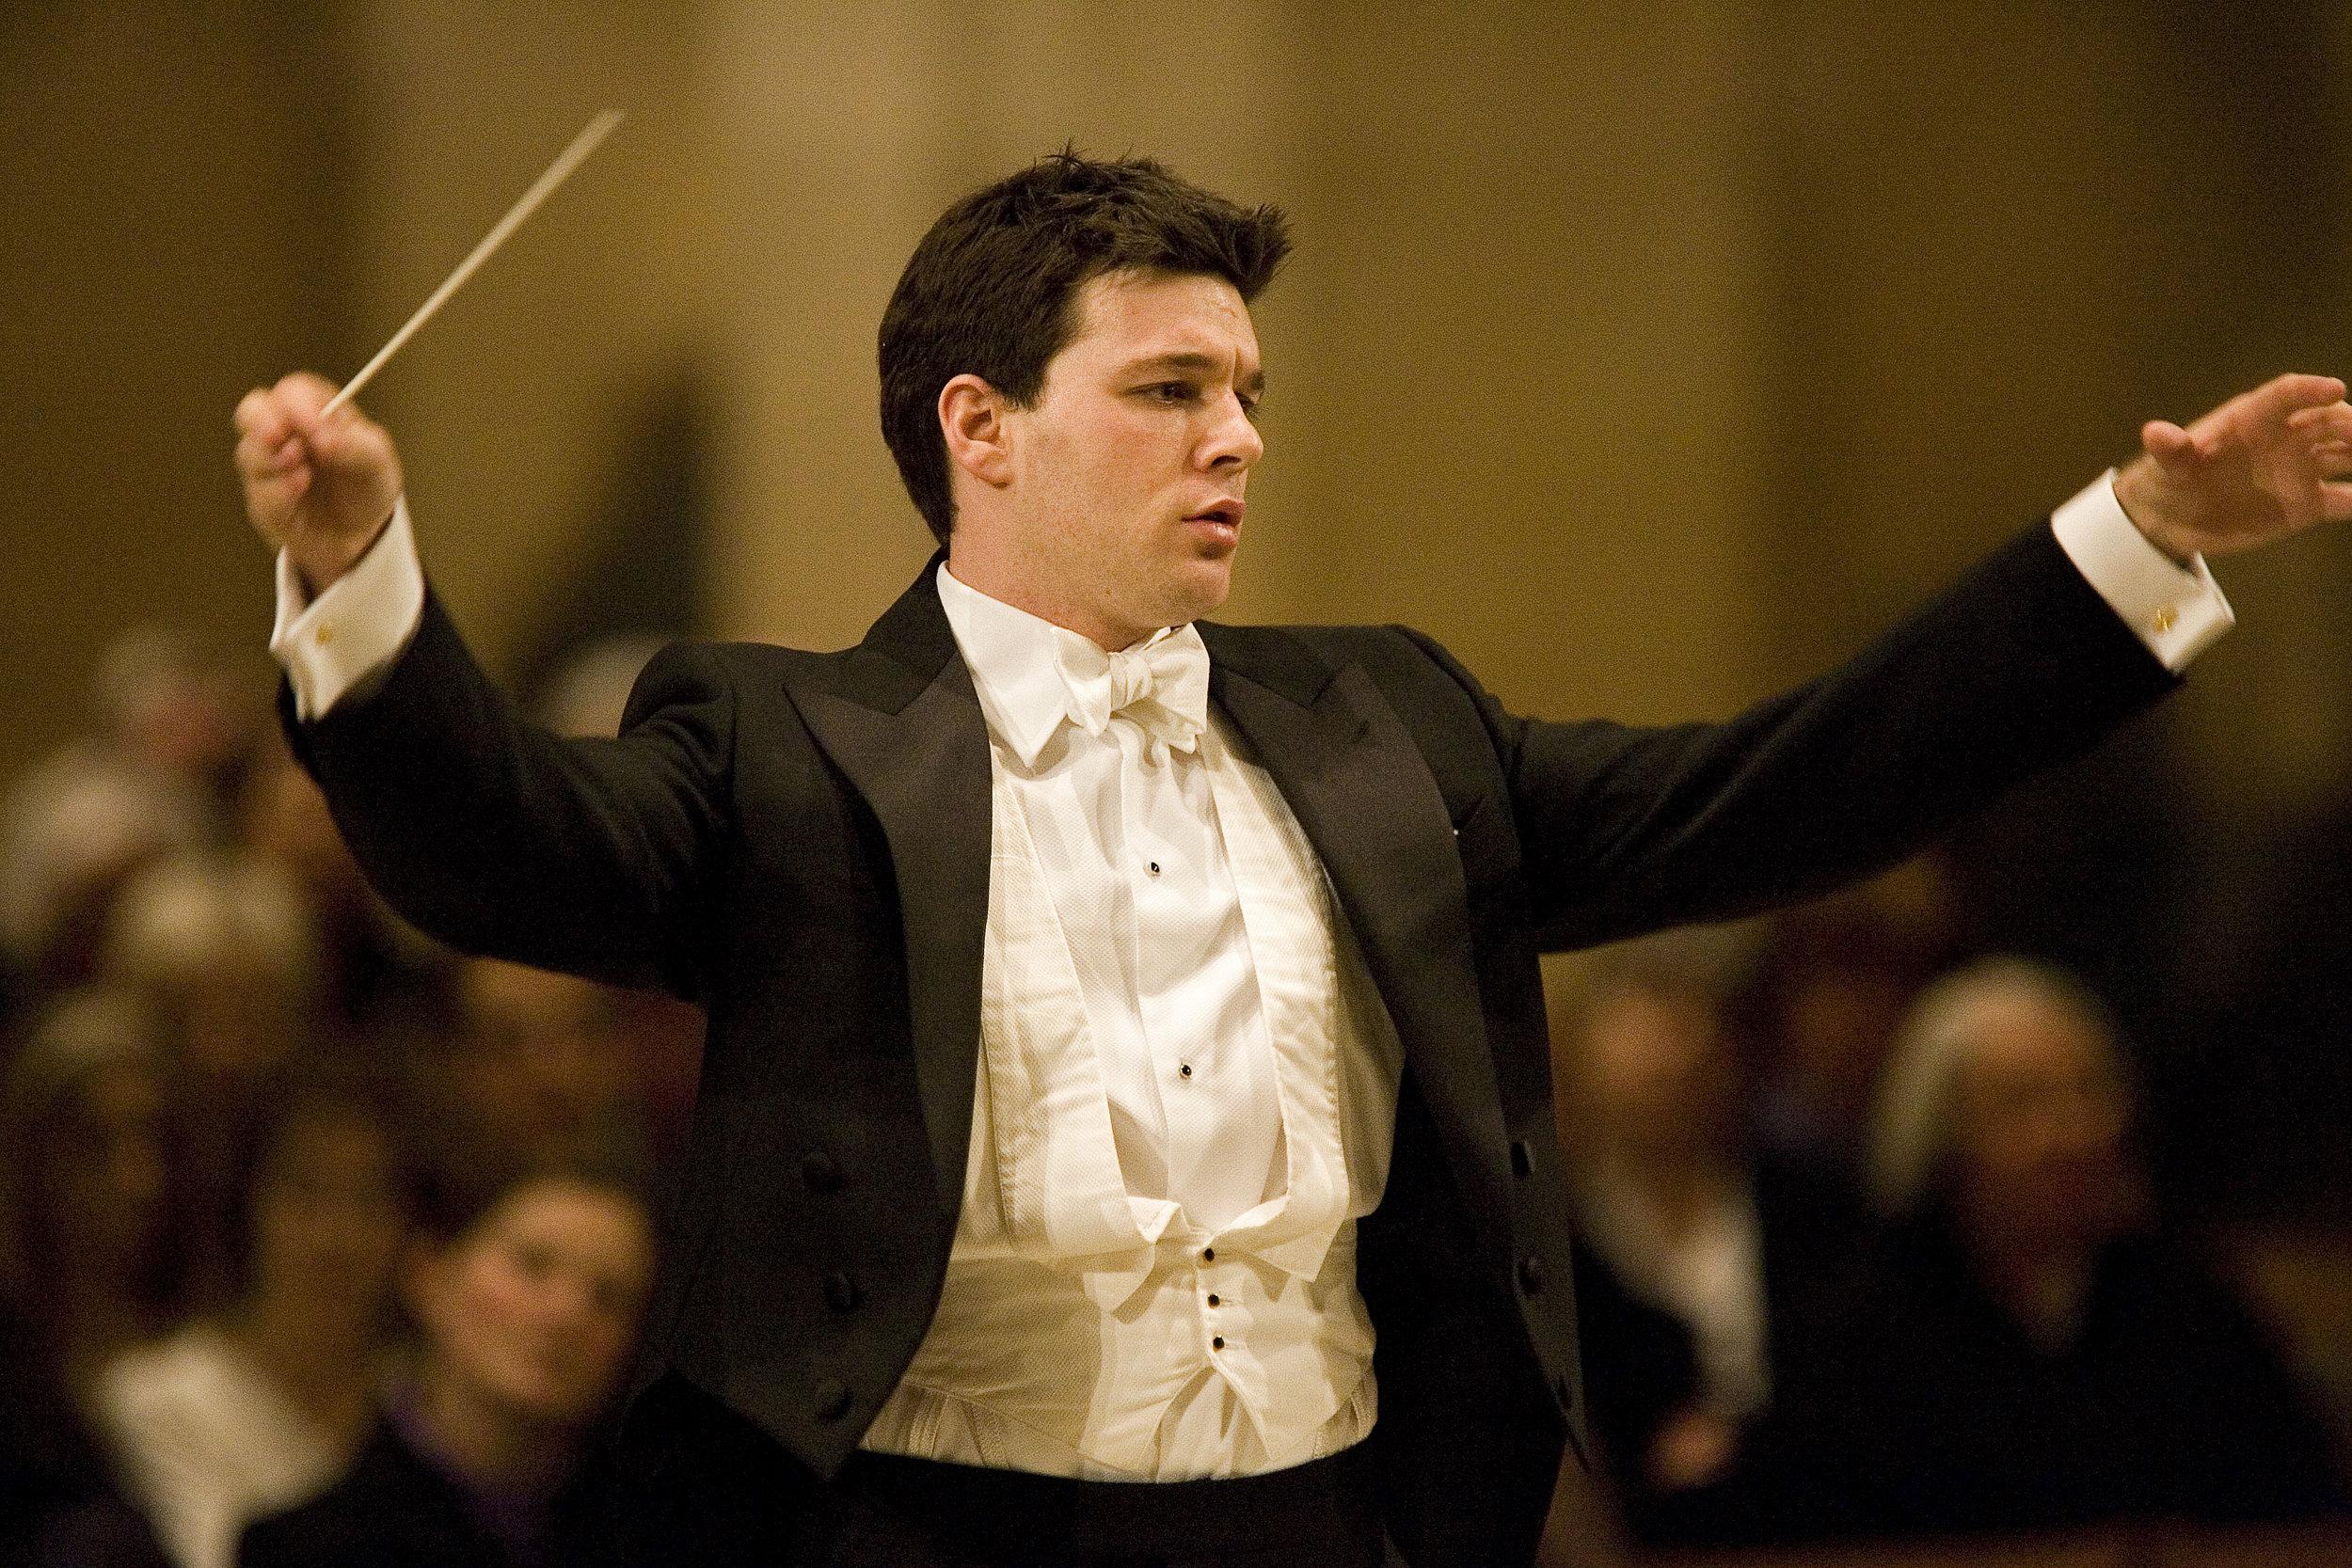 Scott Ellaway_Philharmonia Orchestra (c) Sir Clive Barda.jpg